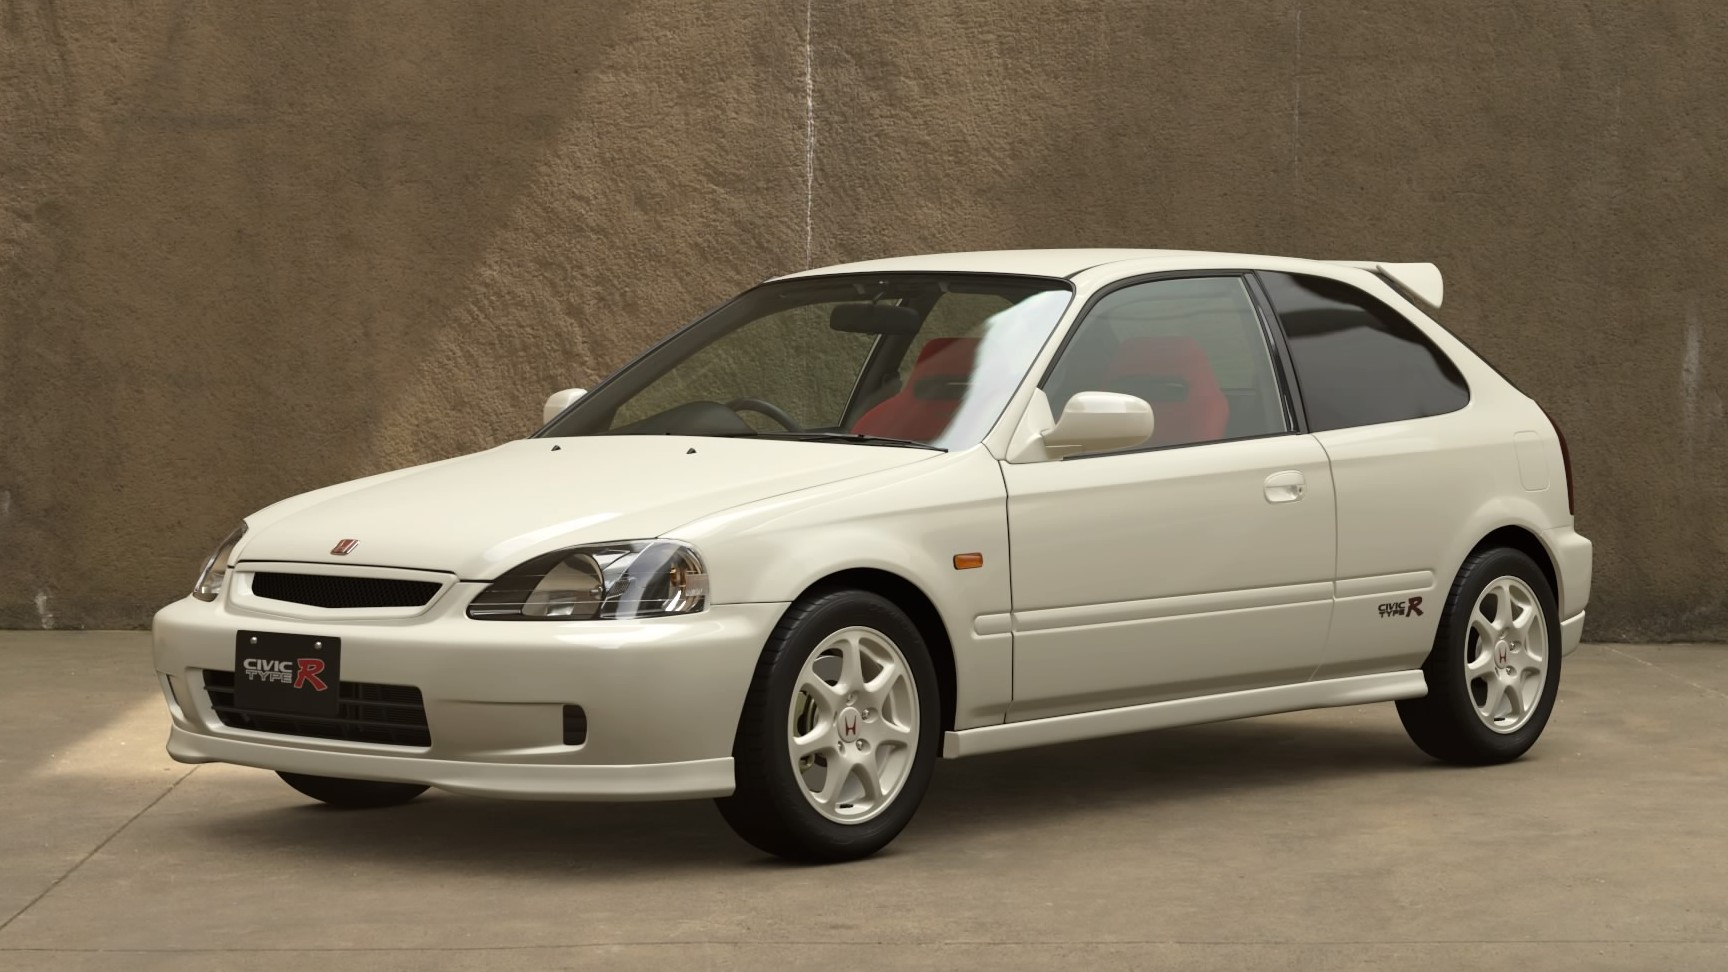 Honda Civic Type R Ek 98 Gran Turismo Wiki Fandom